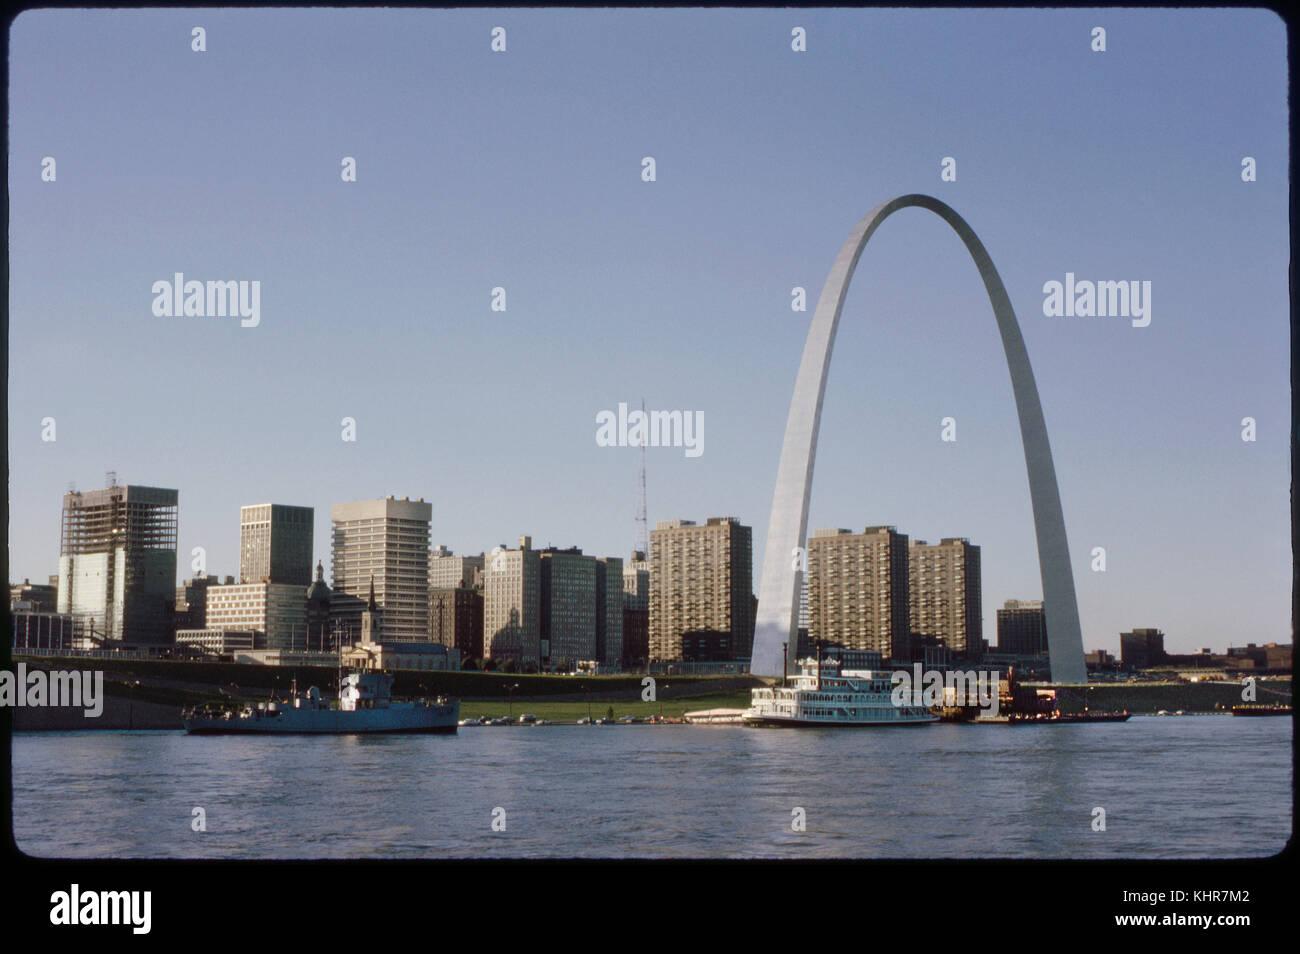 Skyline and Arch, Saint Louis, Missouri, USA, 1970 - Stock Image